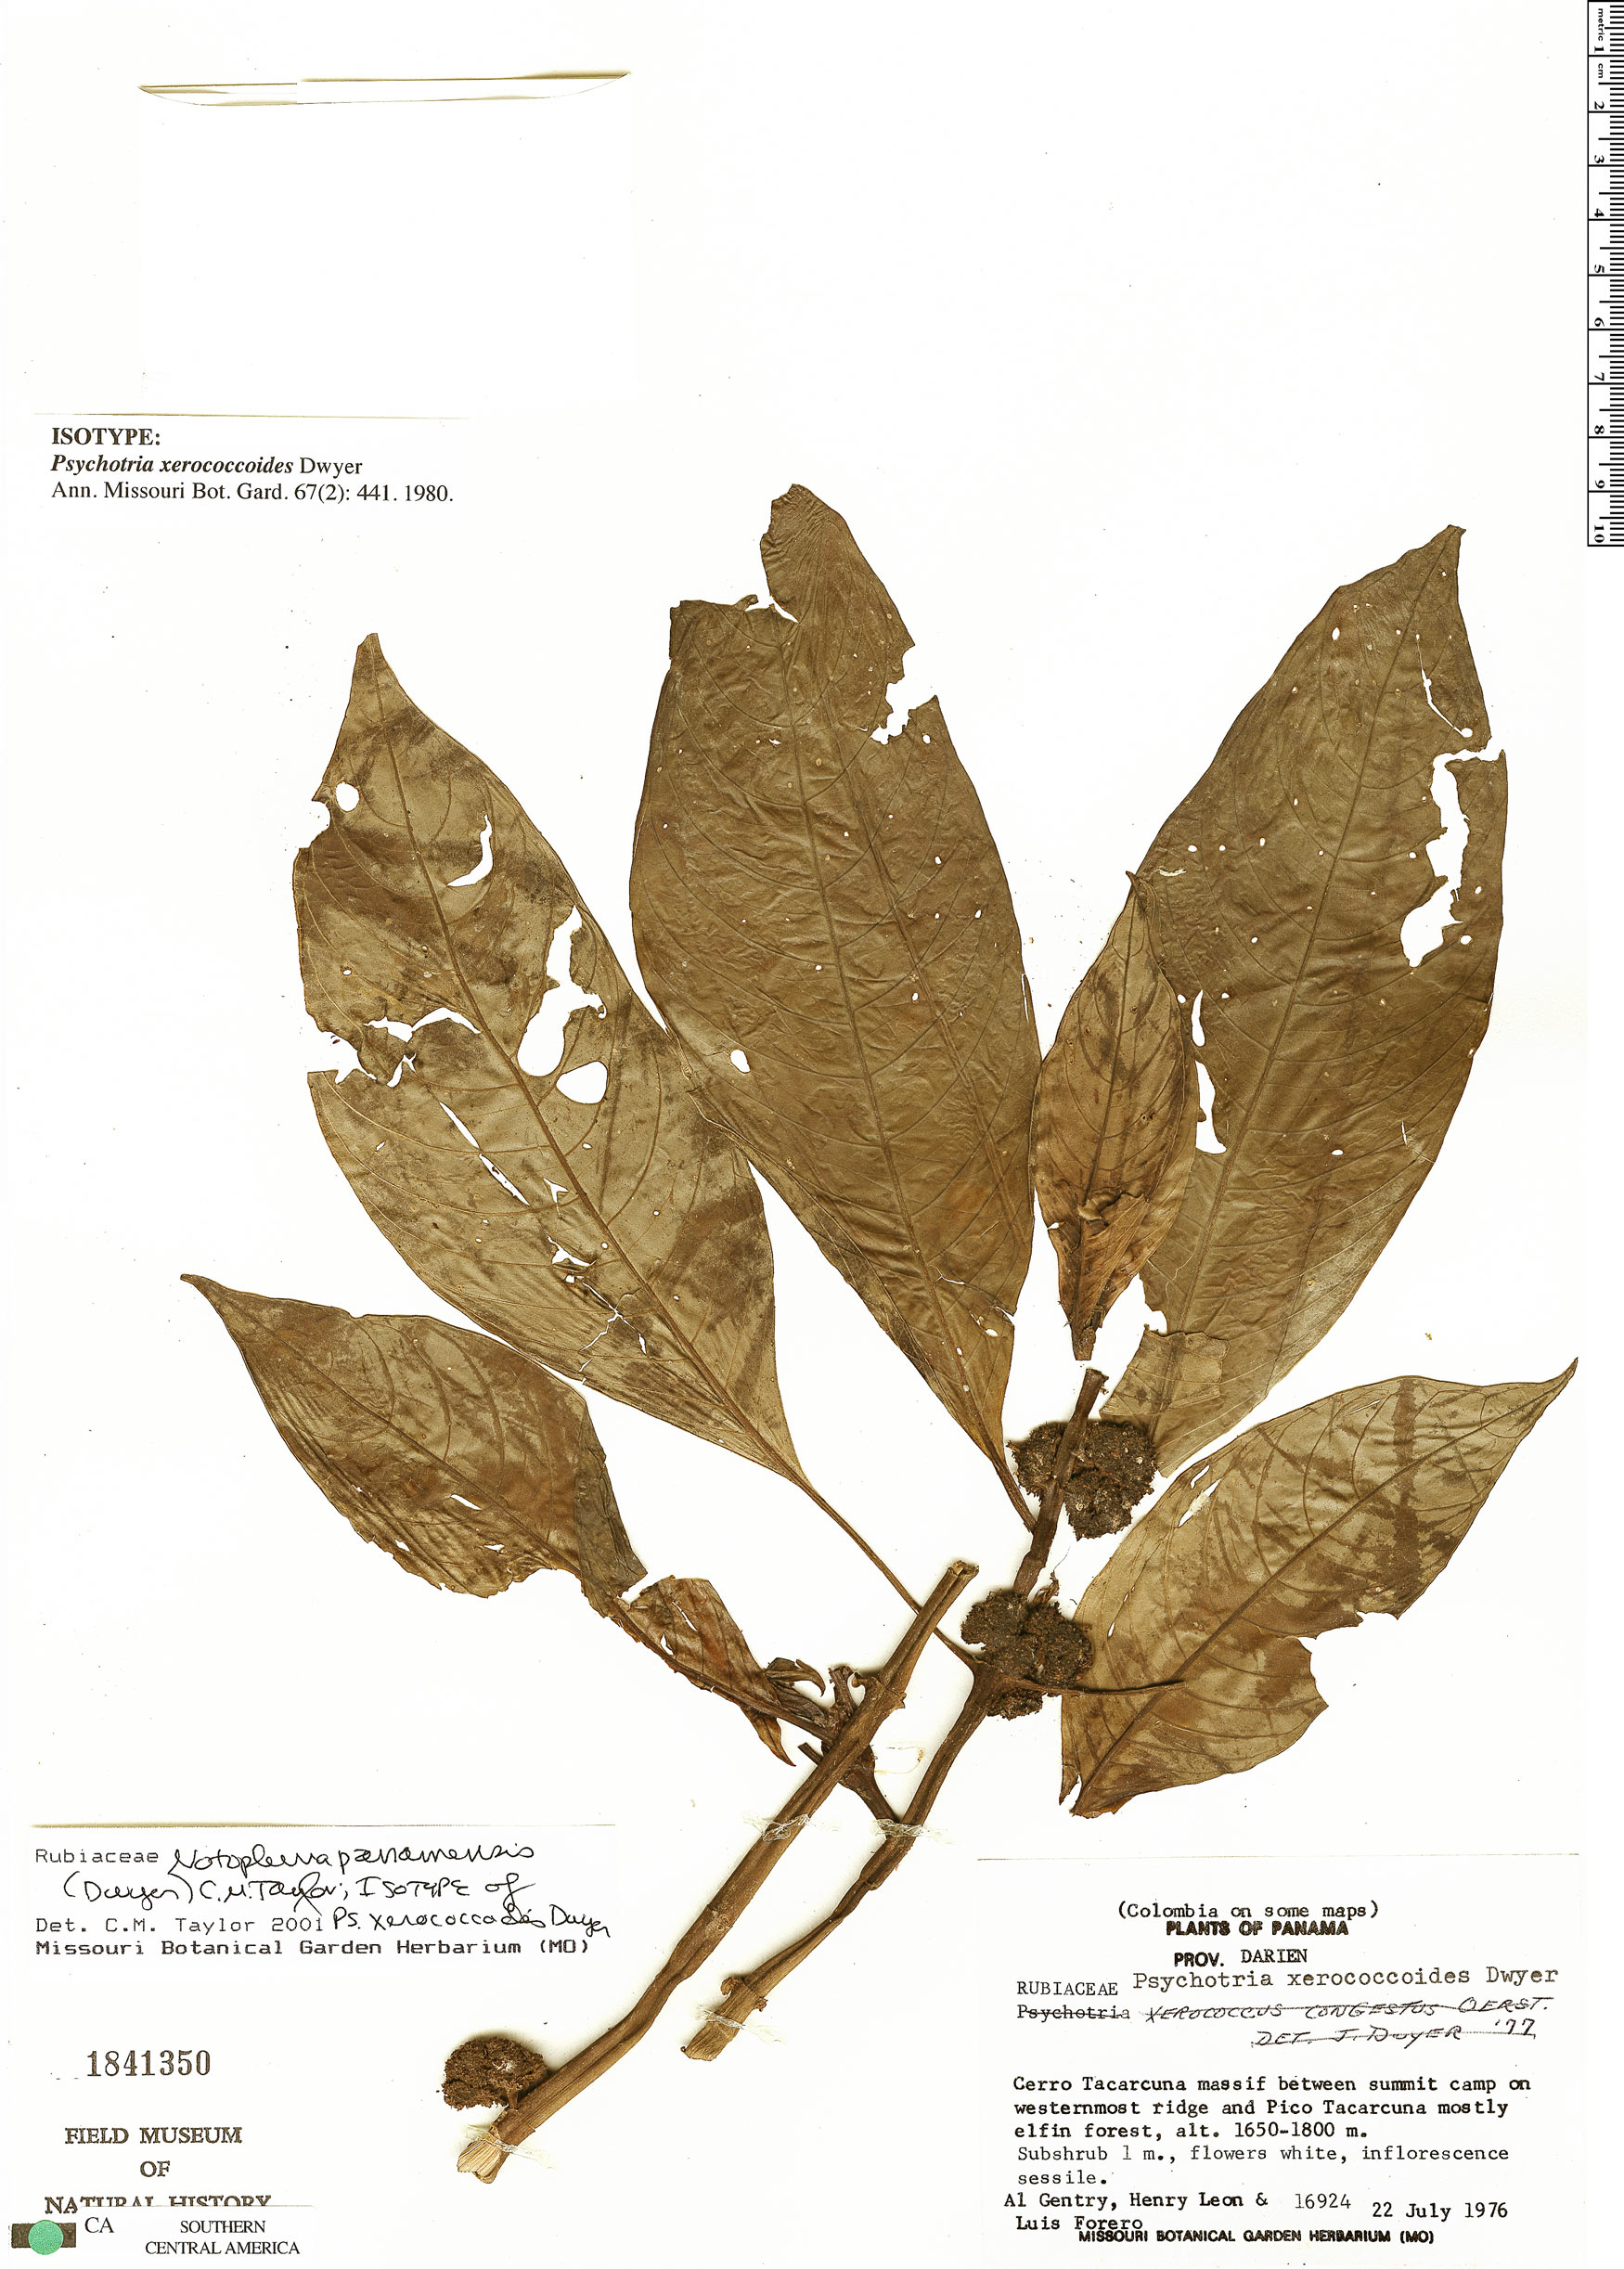 Specimen: Notopleura panamensis